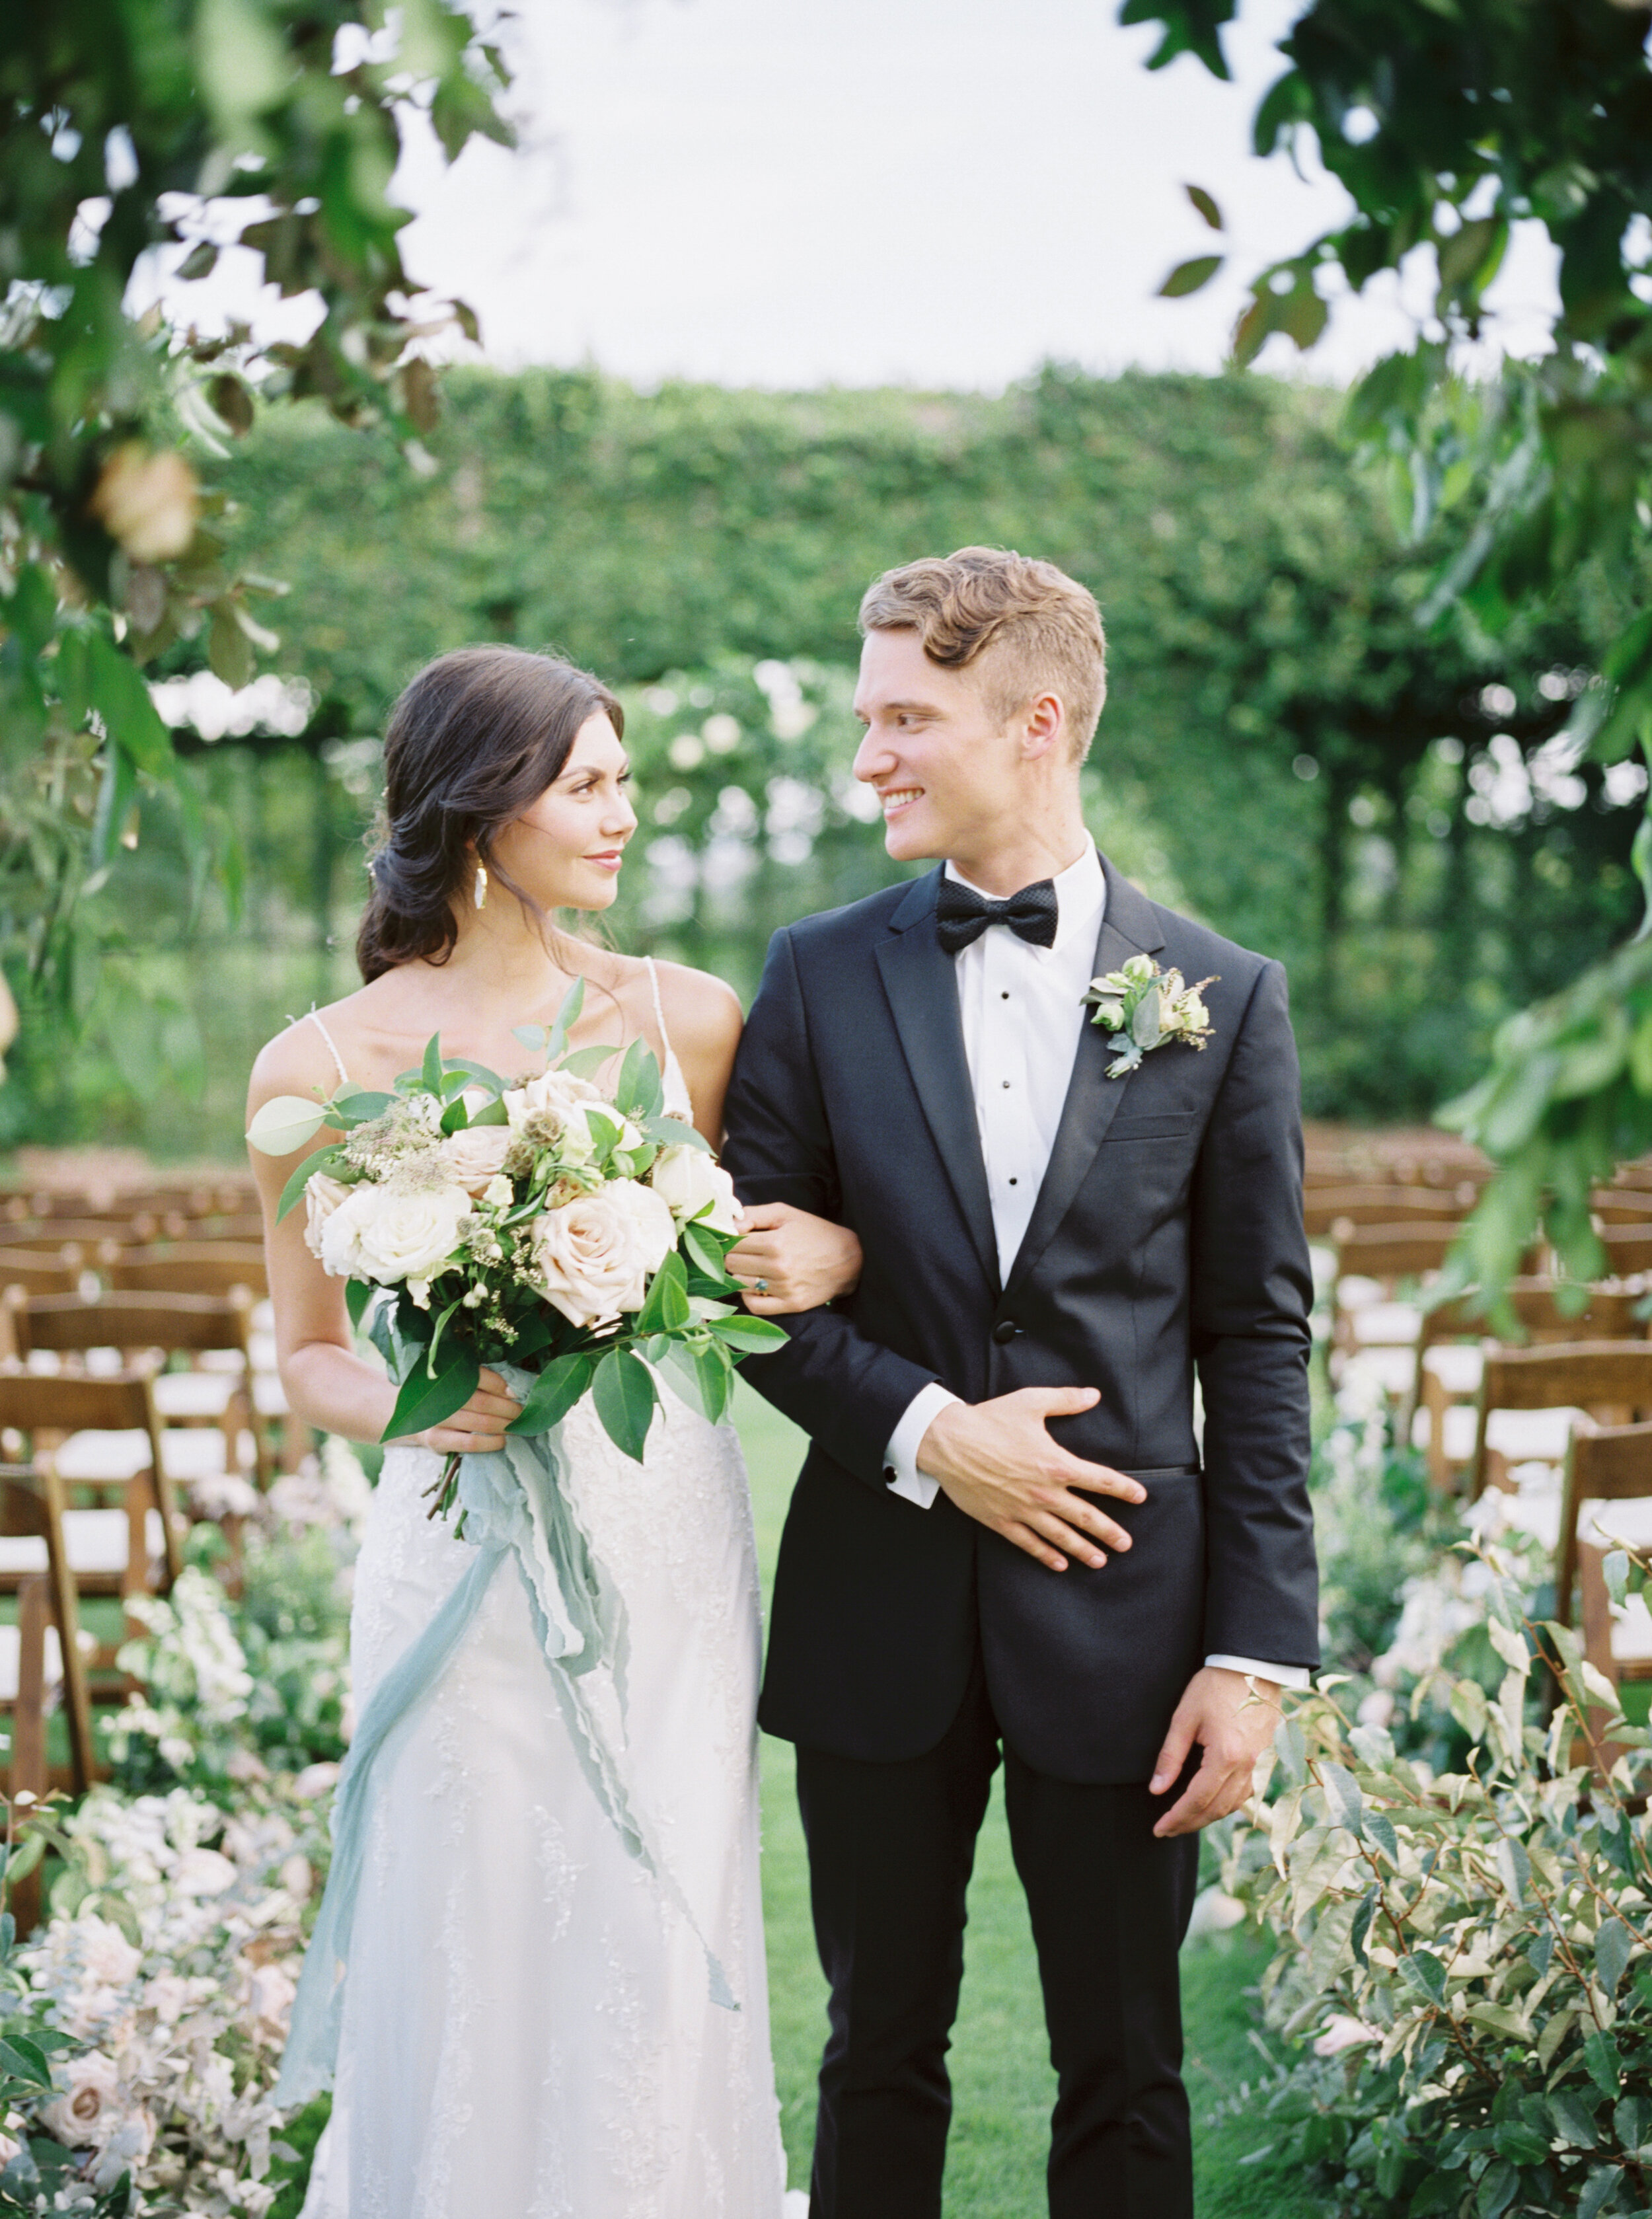 Bibb_Mill_Wedding_Editorial_Columbus_Georgia_Fallen_Photography_6-45.JPG